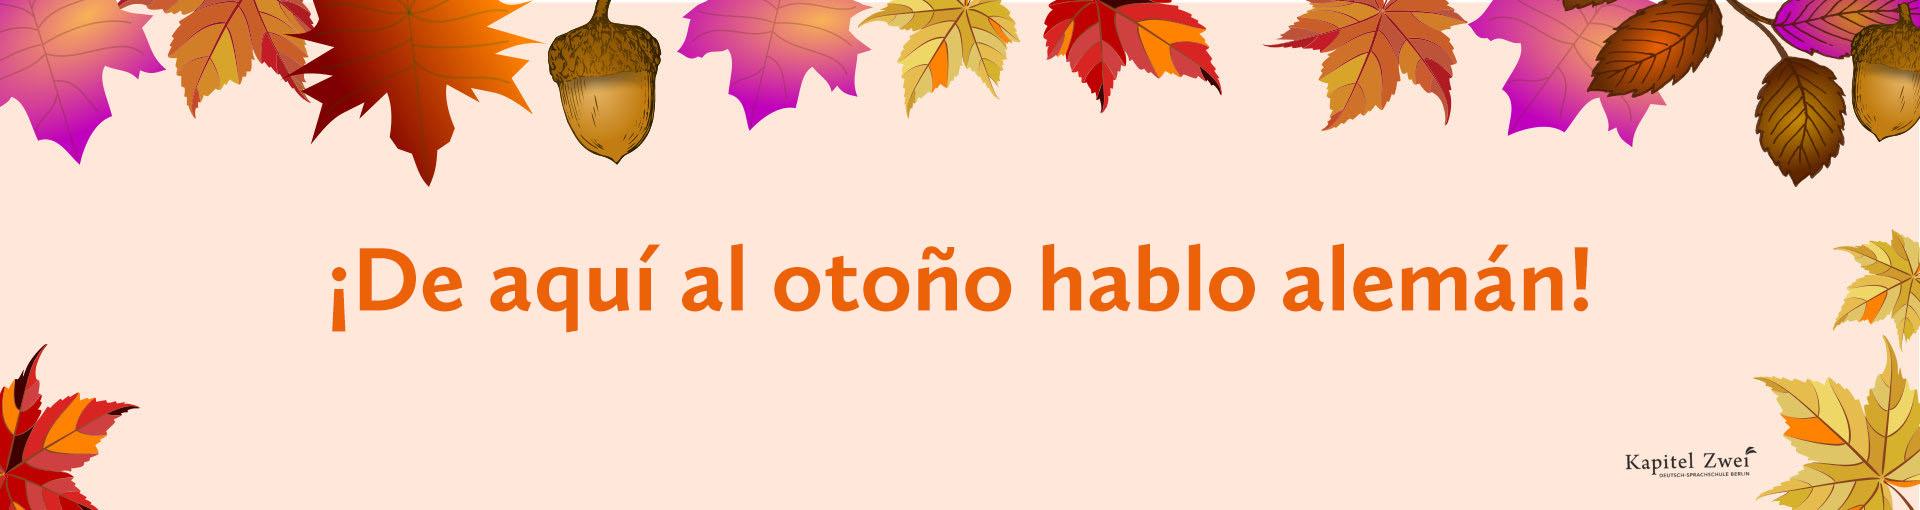 Curso de alemán aprender alemán Berlín online offline